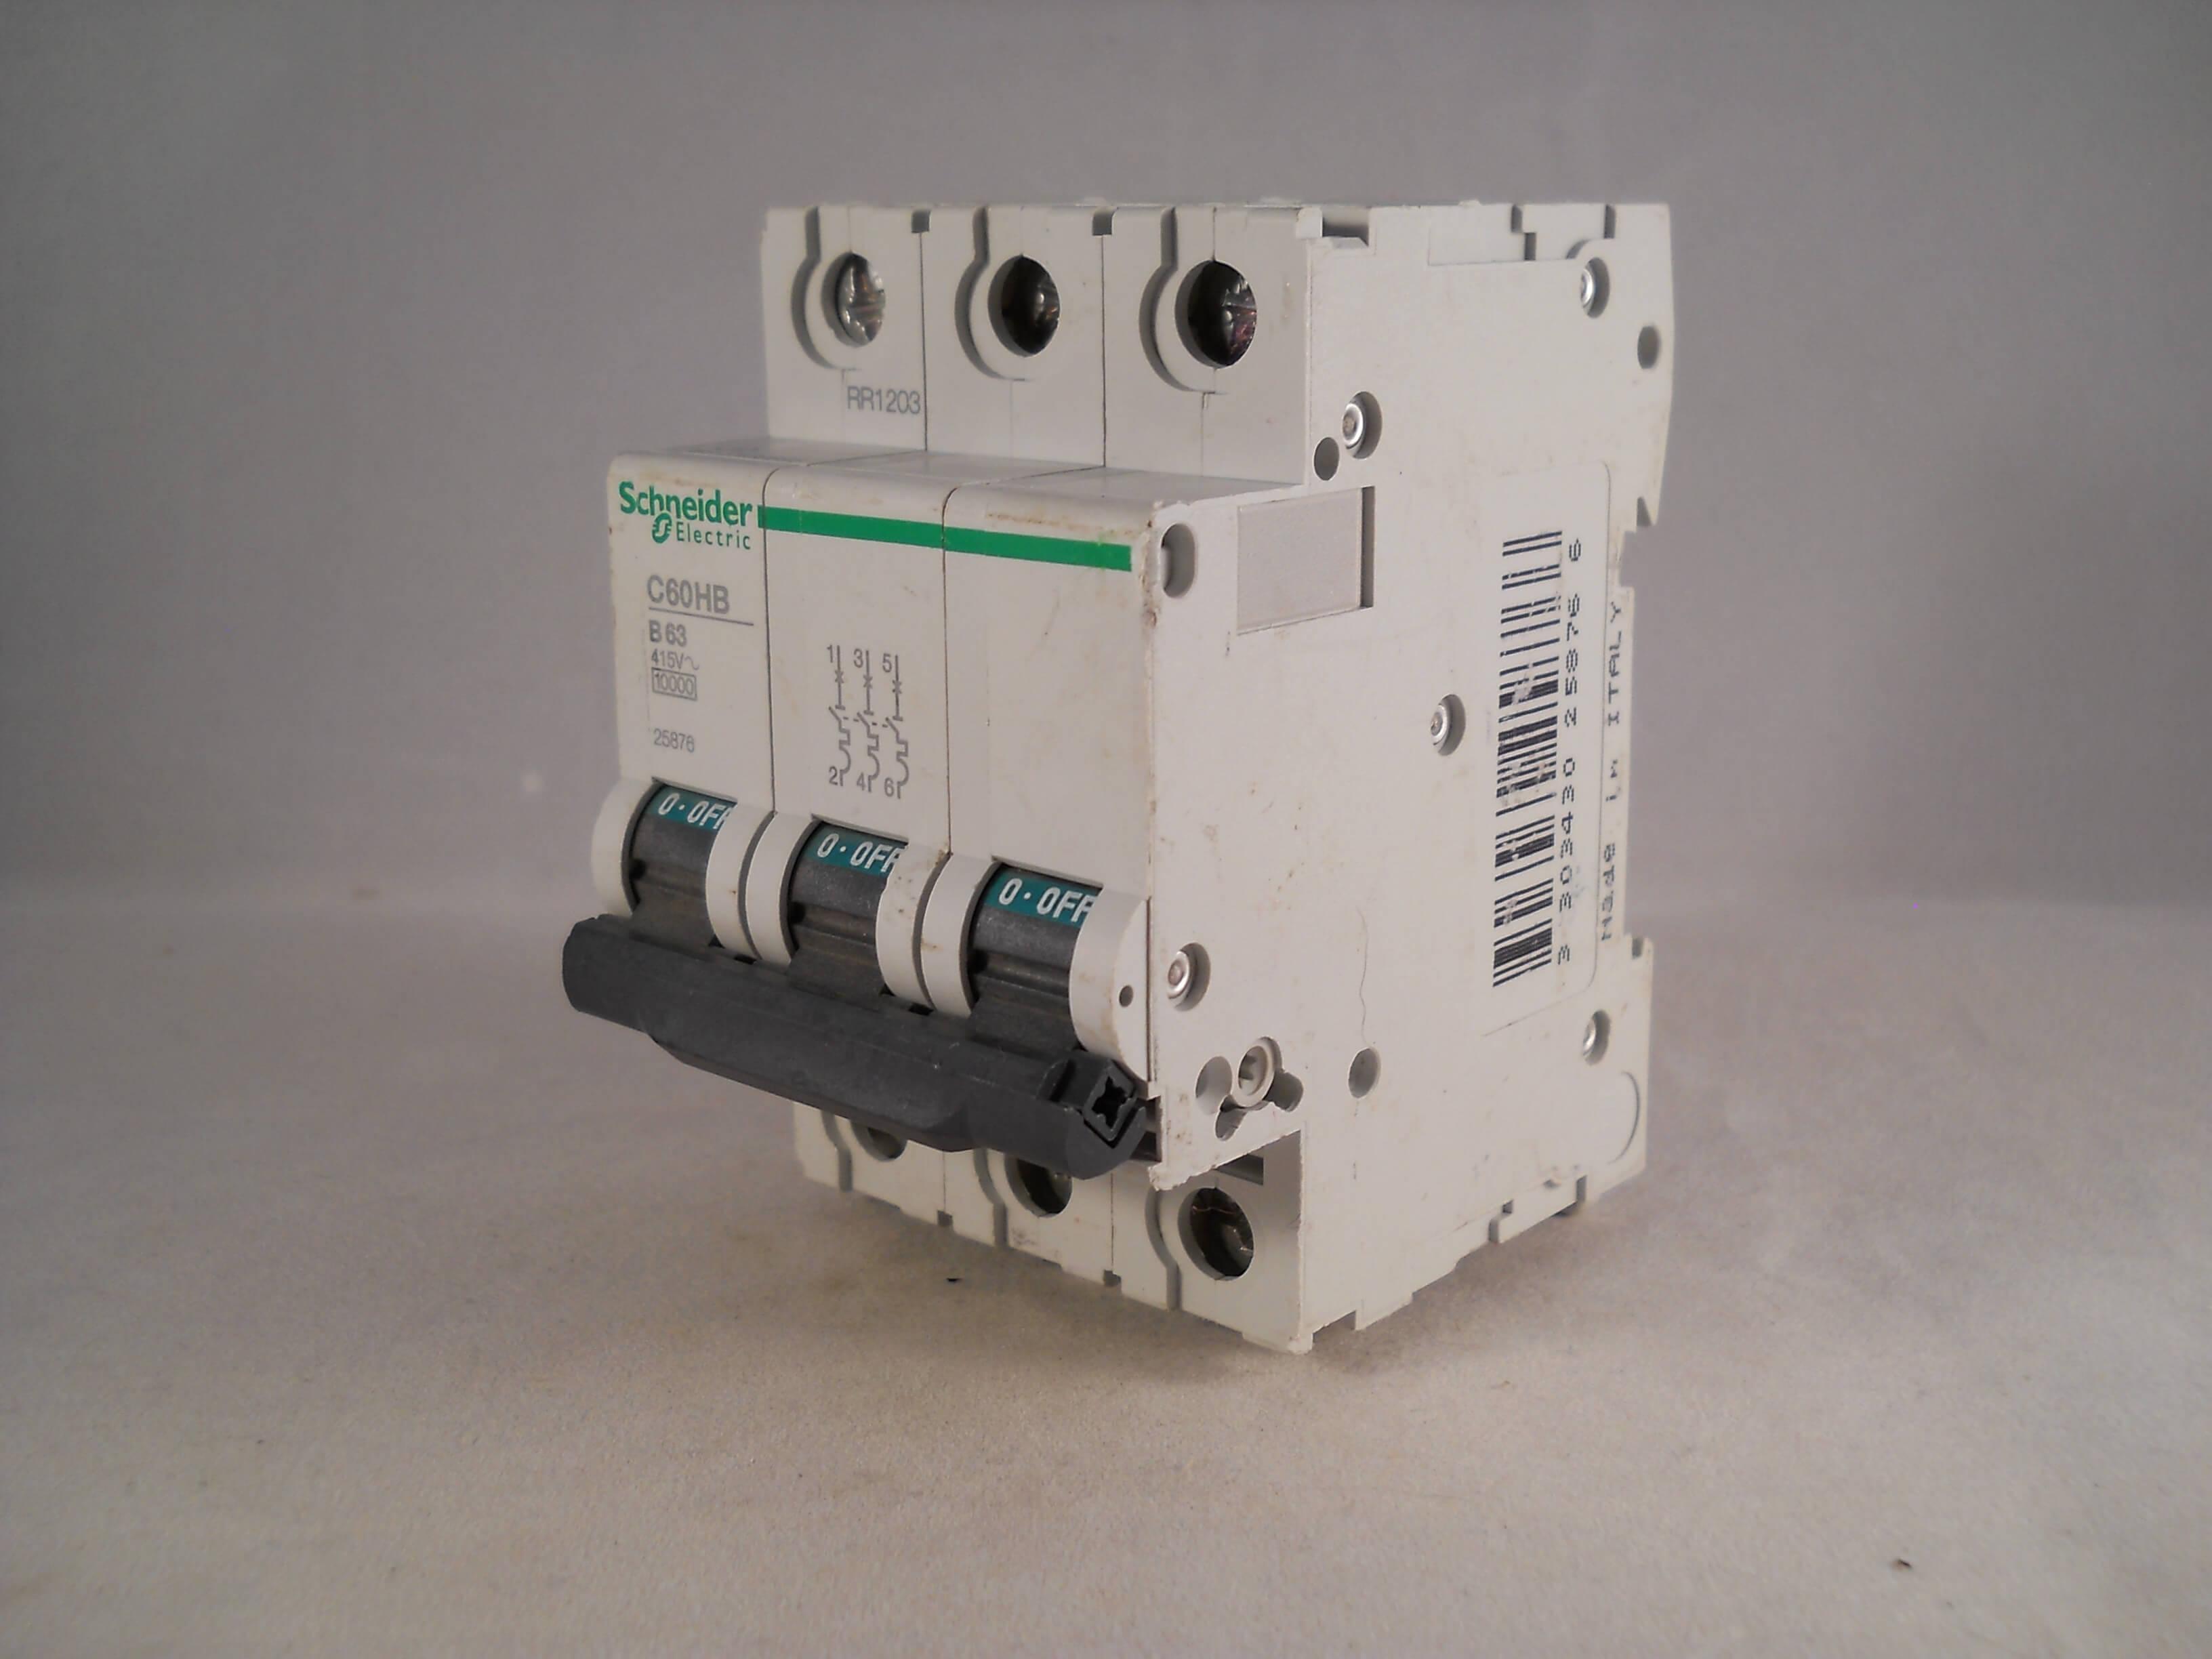 Mcb Schneider 10a Domae Electric Update Daftar Harga Terbaru Indonesia Rcbo Slim 1p N Source